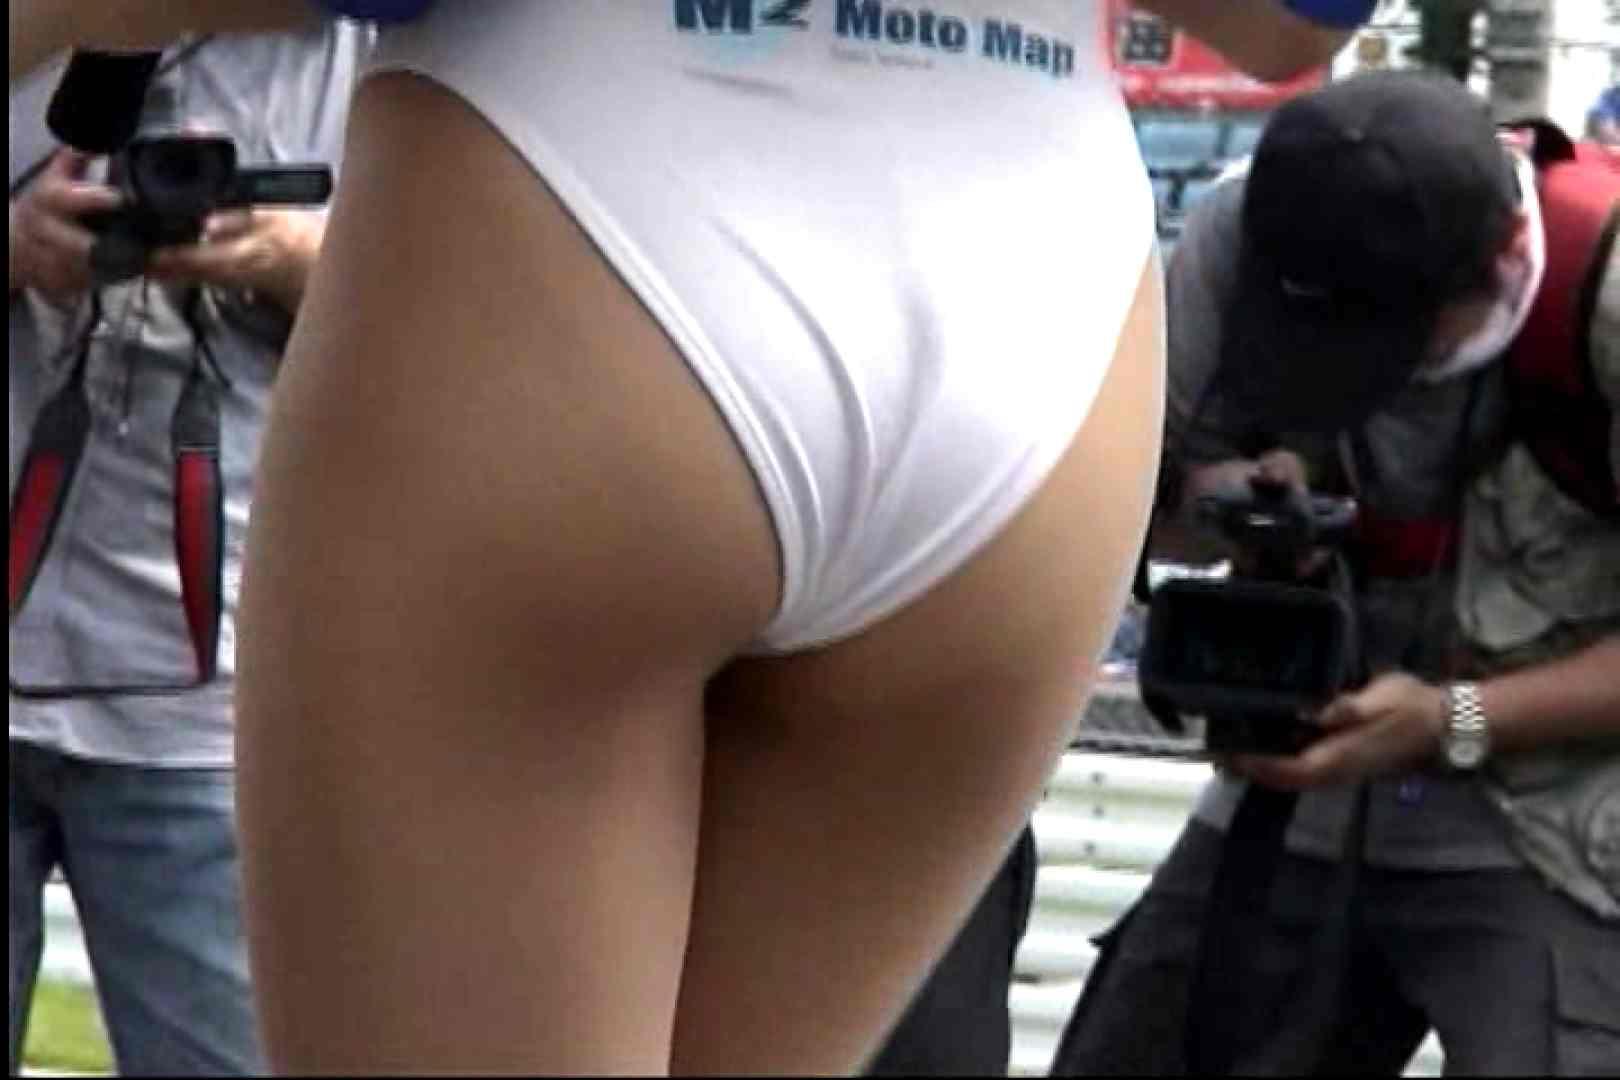 RQカメラ地獄Vol.5 ハプニング のぞき動画画像 78連発 20